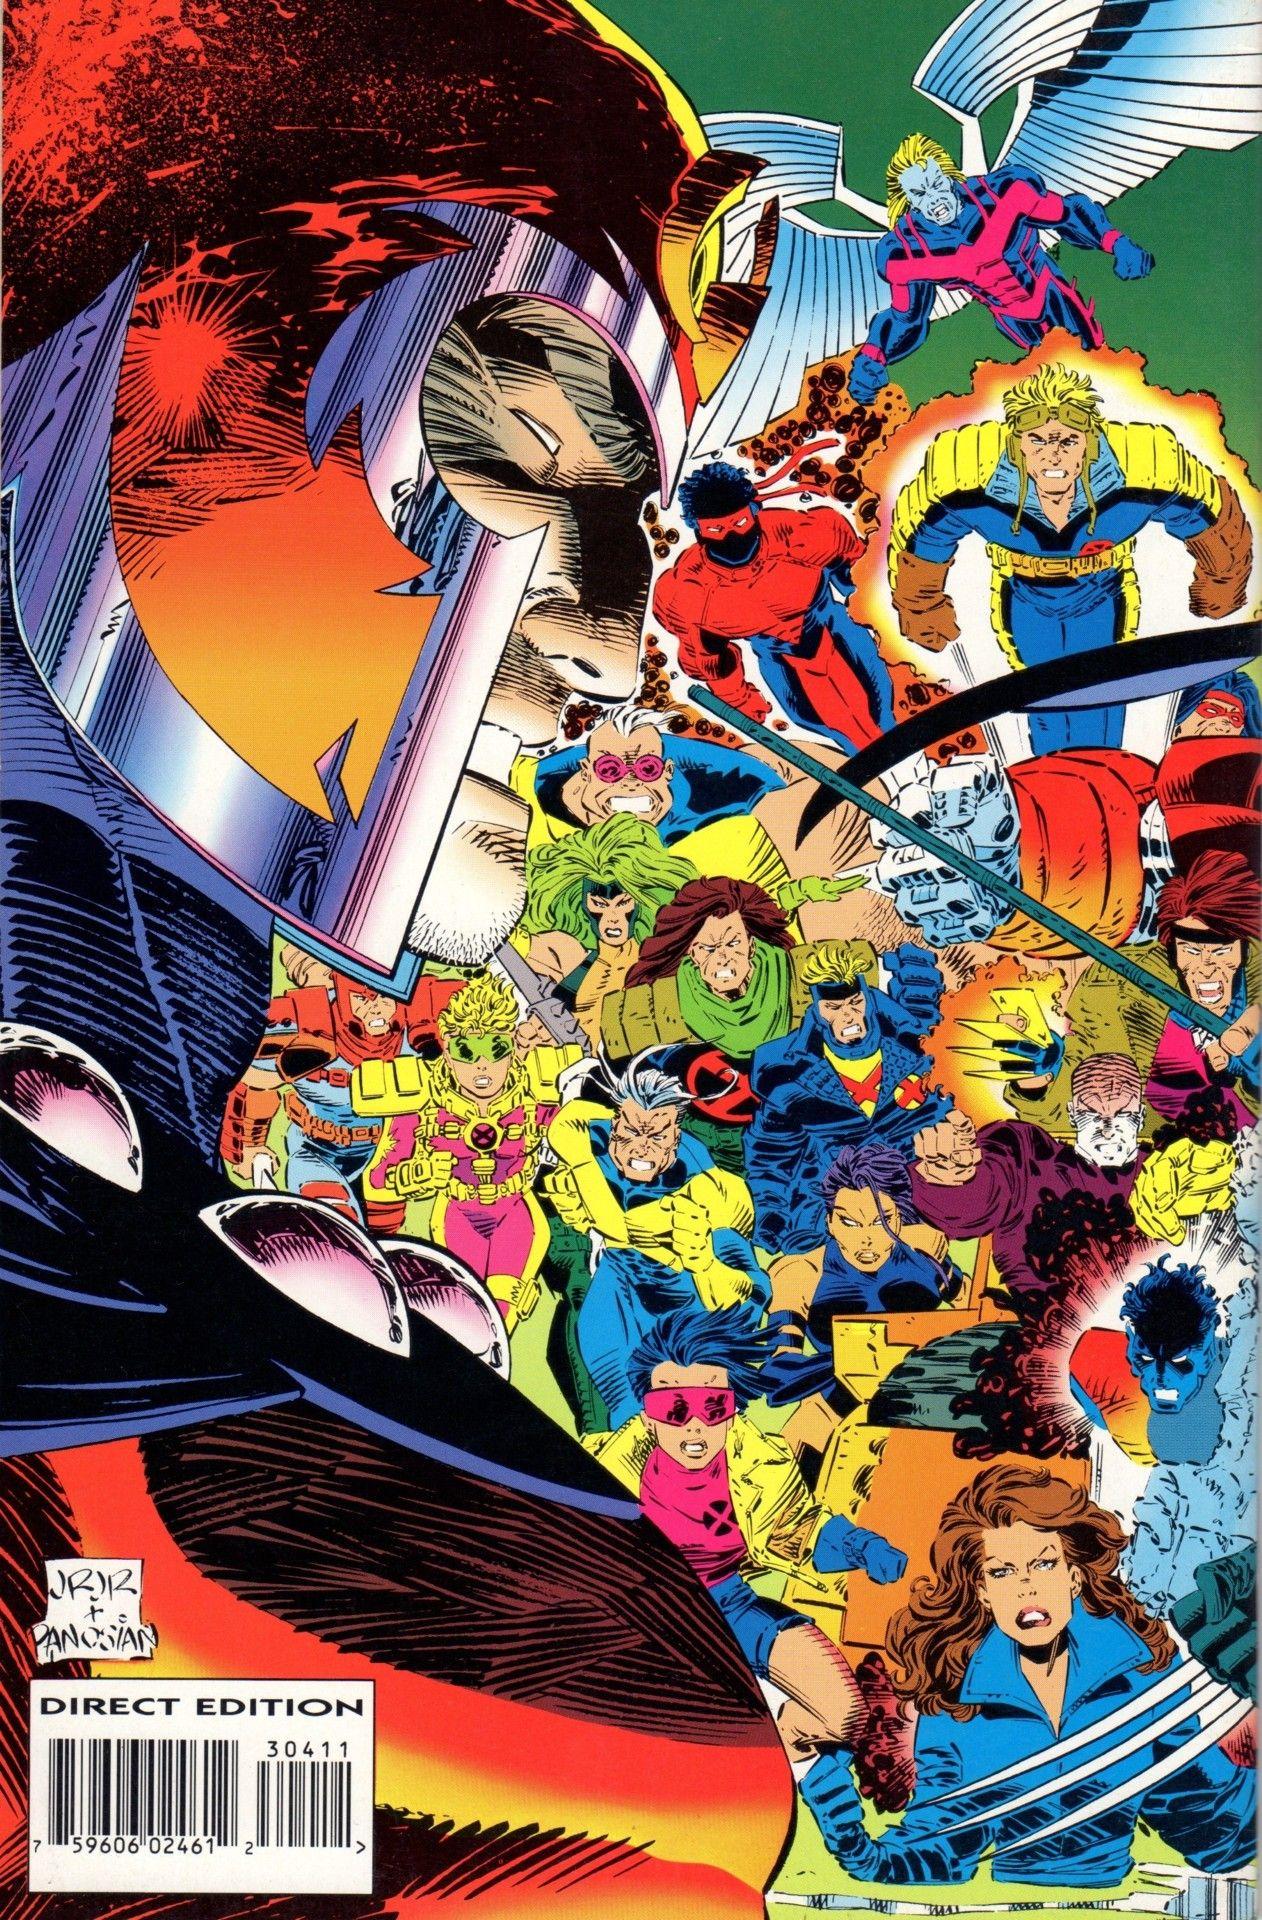 Magneto The X Men Just How I Remember Them On That 1st Issue Cover Marvel Comics Art Marvel Comics Superheroes X Men